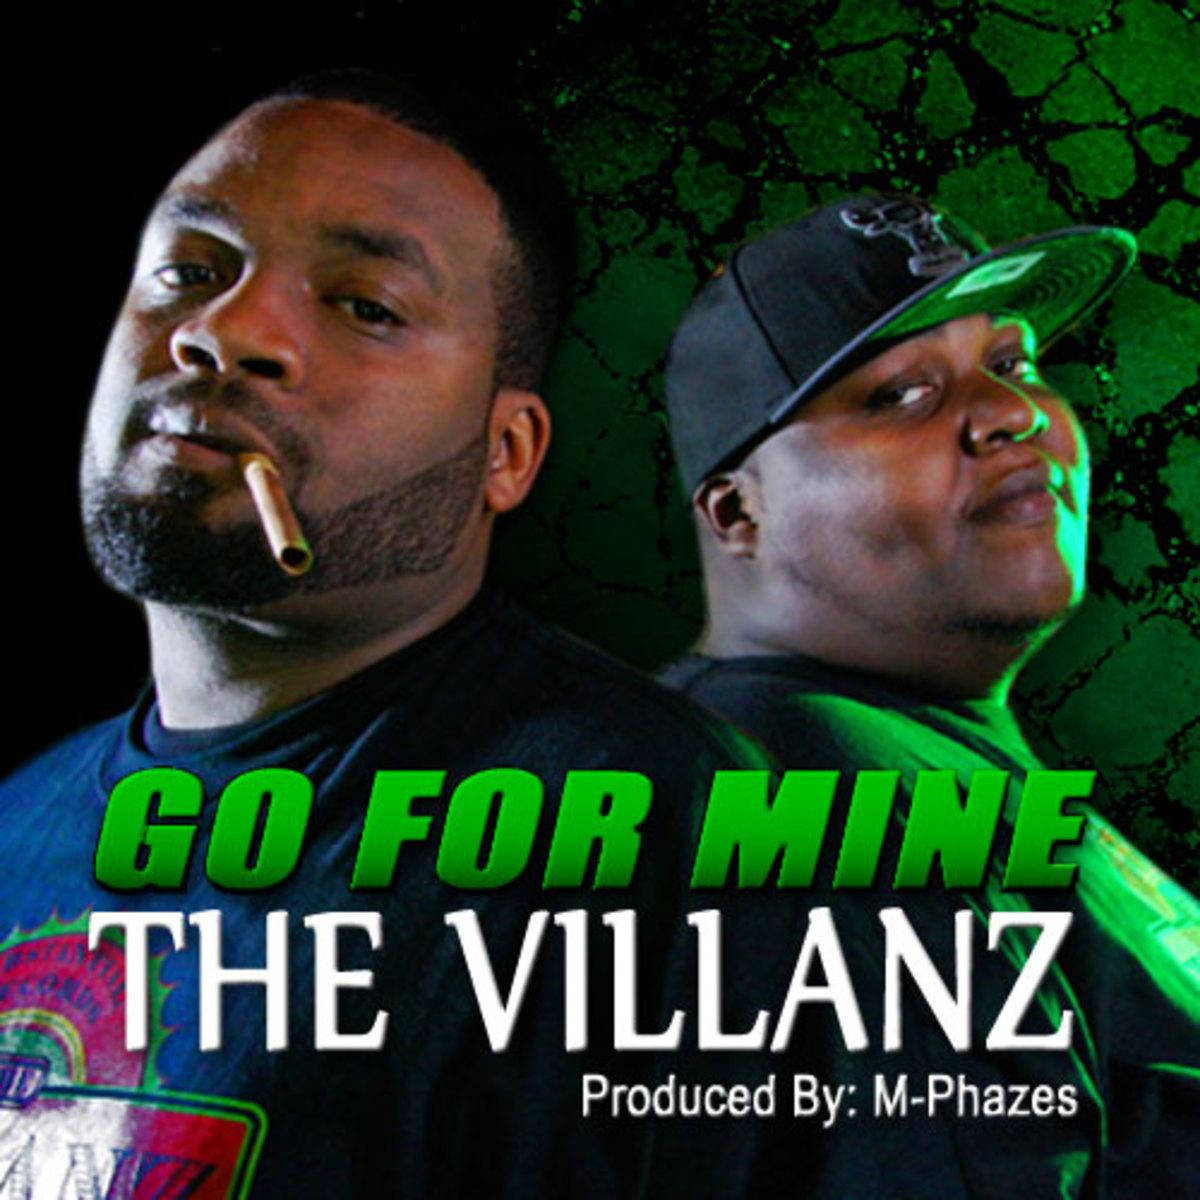 thevillanz-goformine.jpg